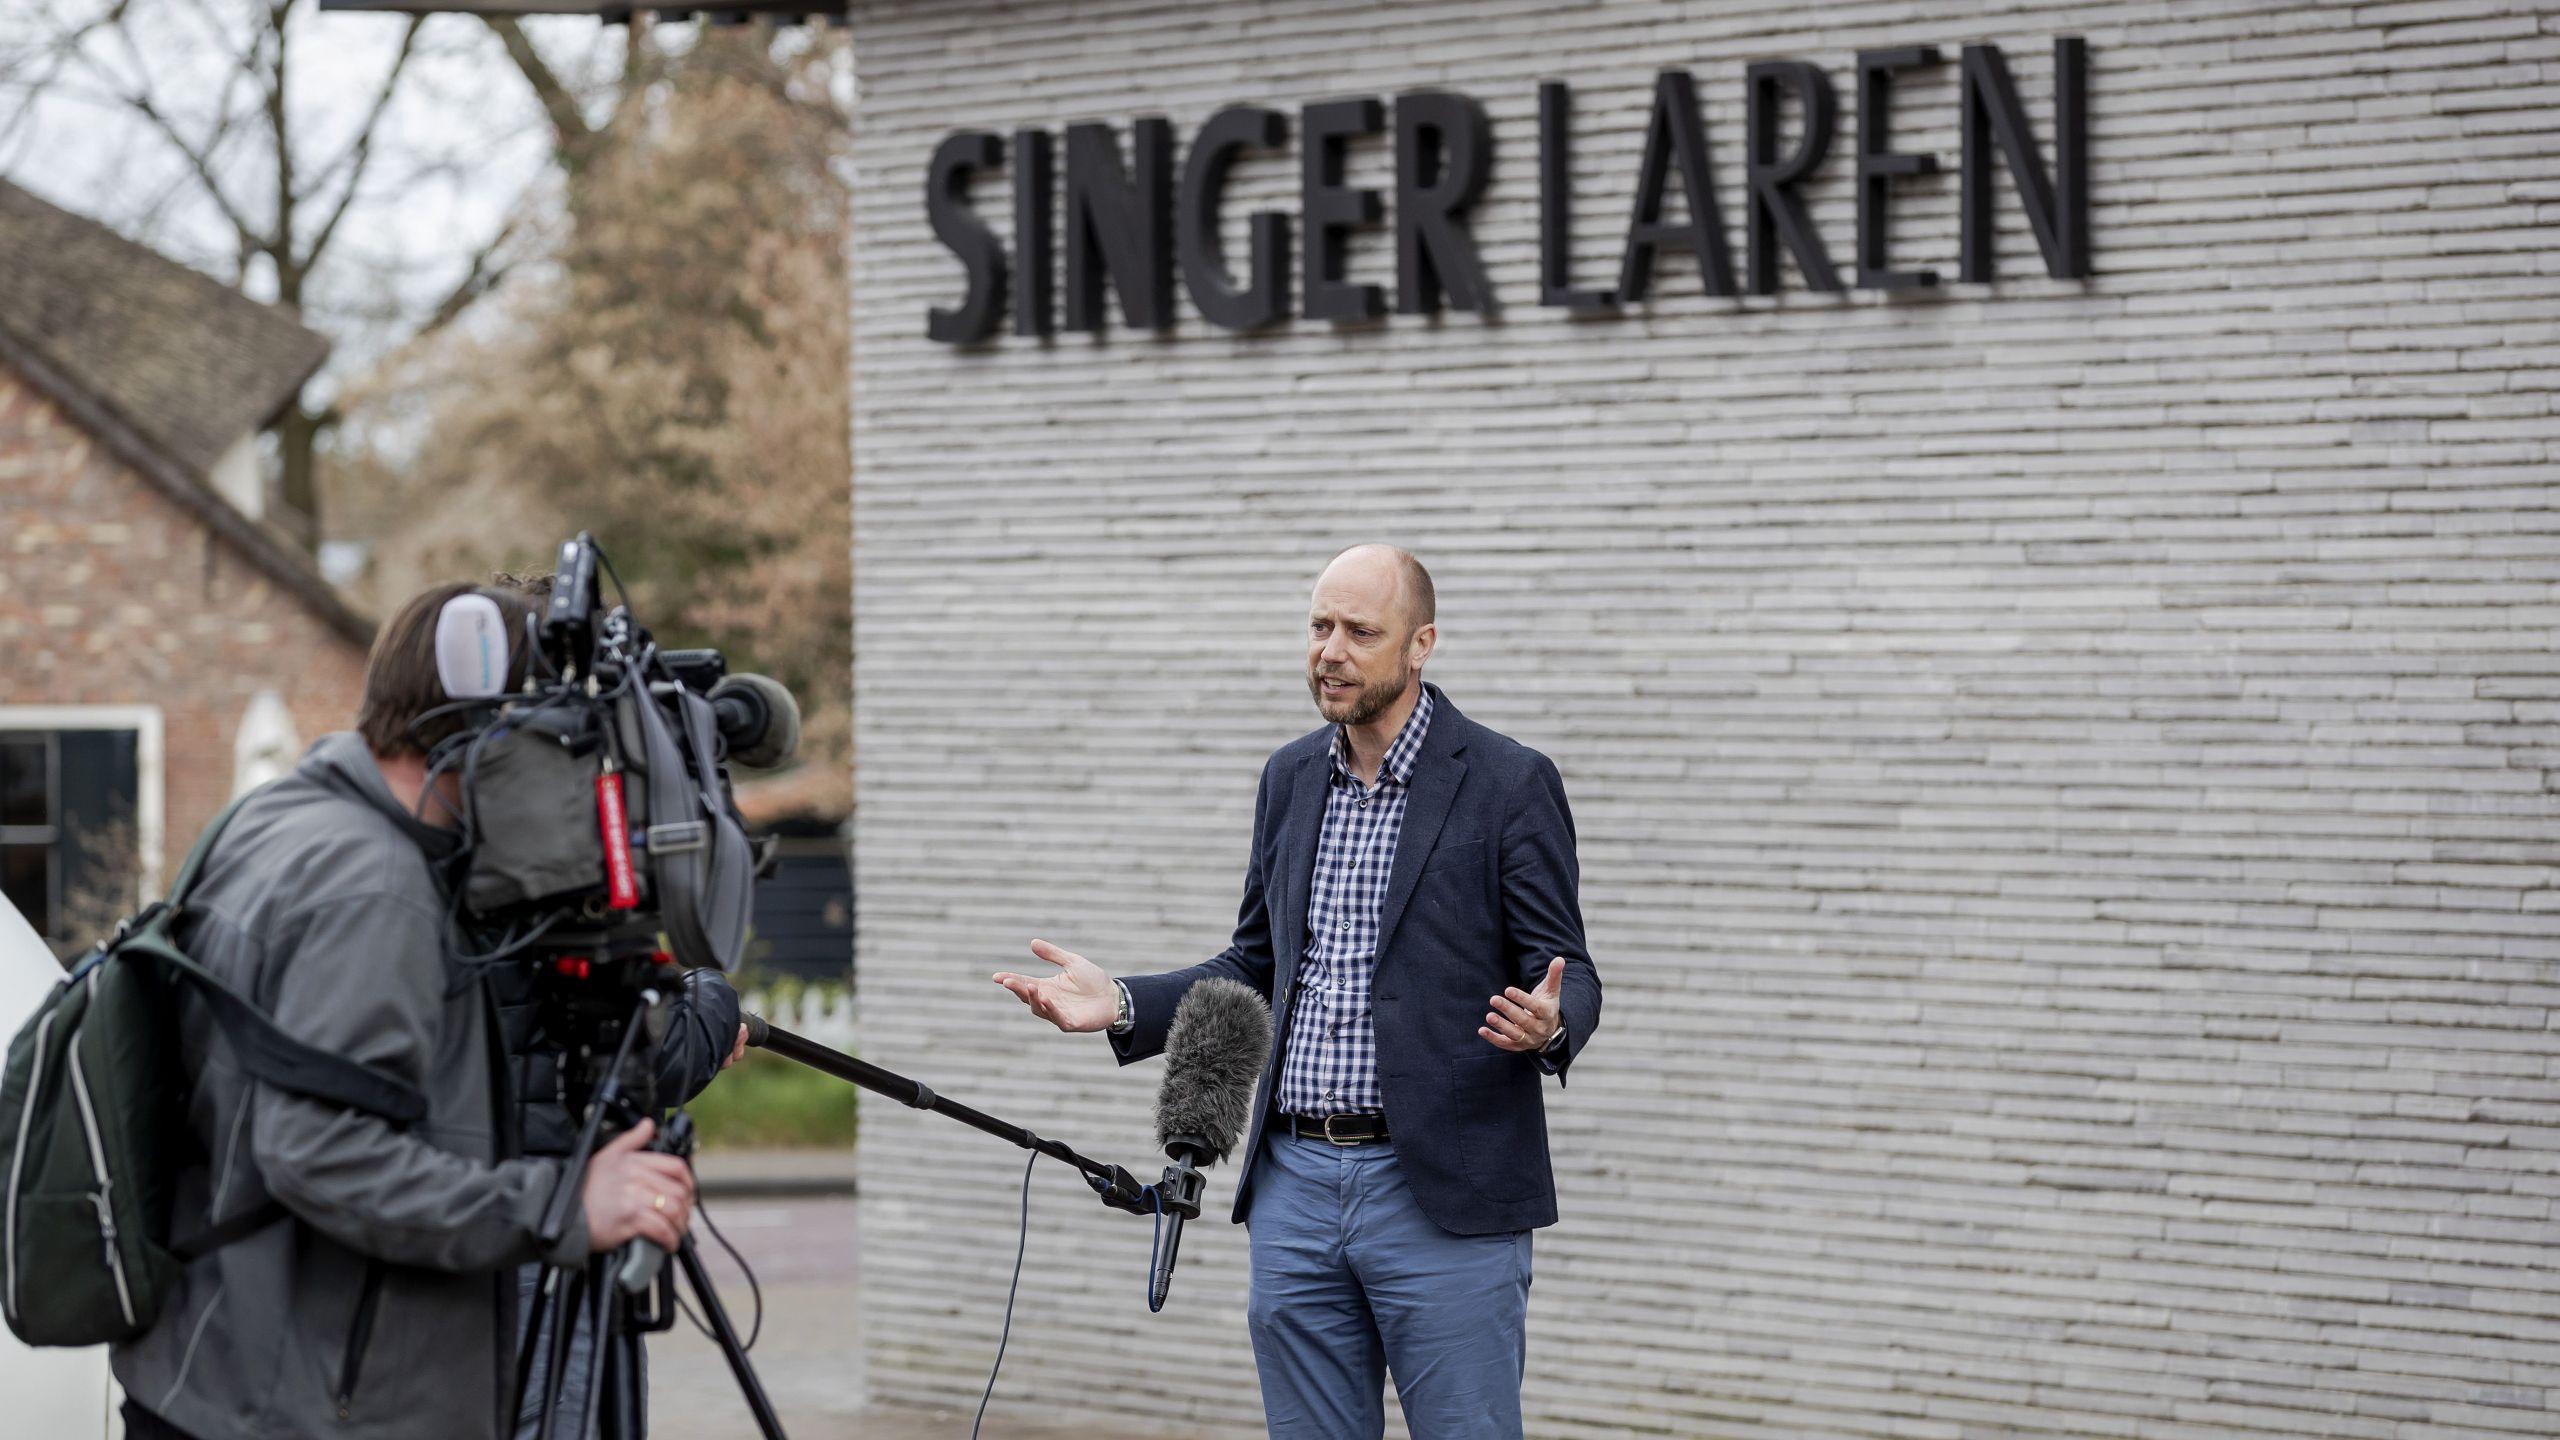 Evert van Os of Singer Laren Museum speaks to the press outside the museum on March 30, 2020 in Laren, Netherlands. (ROBIN VAN LONKHUIJSEN/ANP/AFP via Getty Images)